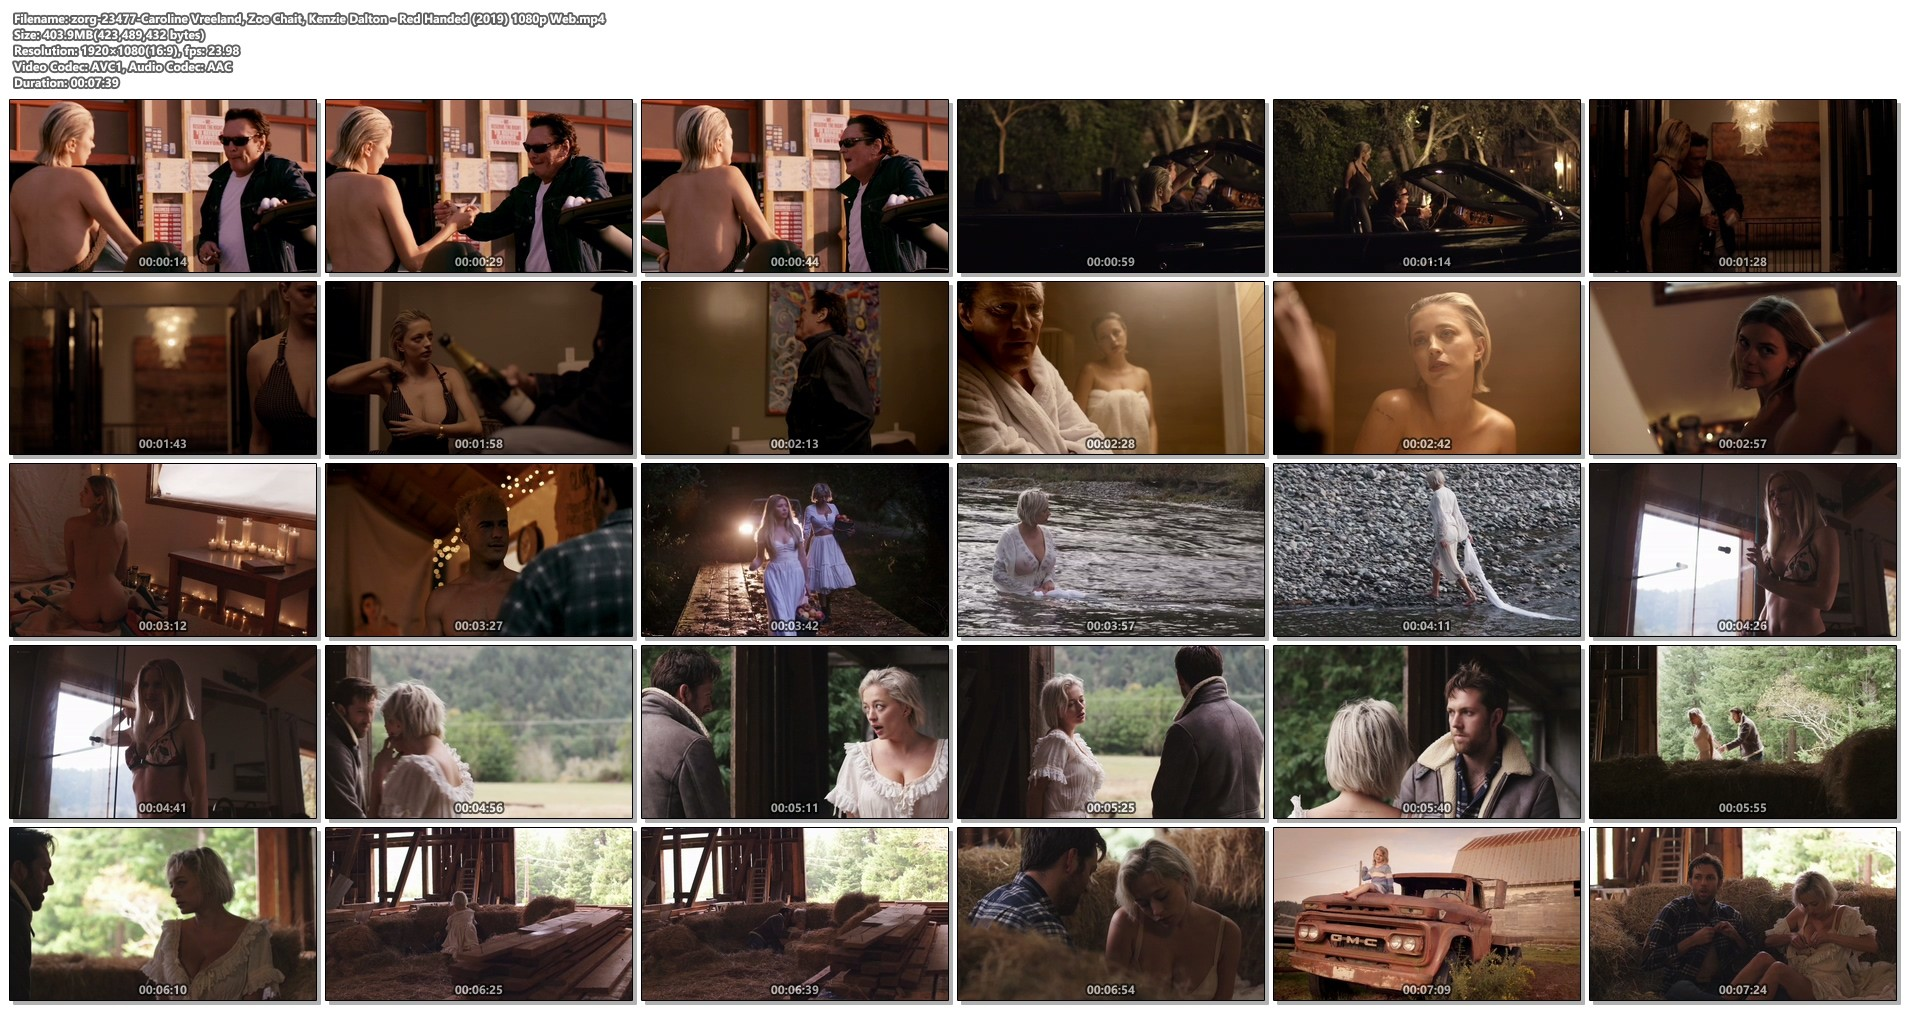 Caroline Vreeland busty see through Zoe Chait, Kenzie Dalton hot - Red Handed (2019) 1080p Web (1)